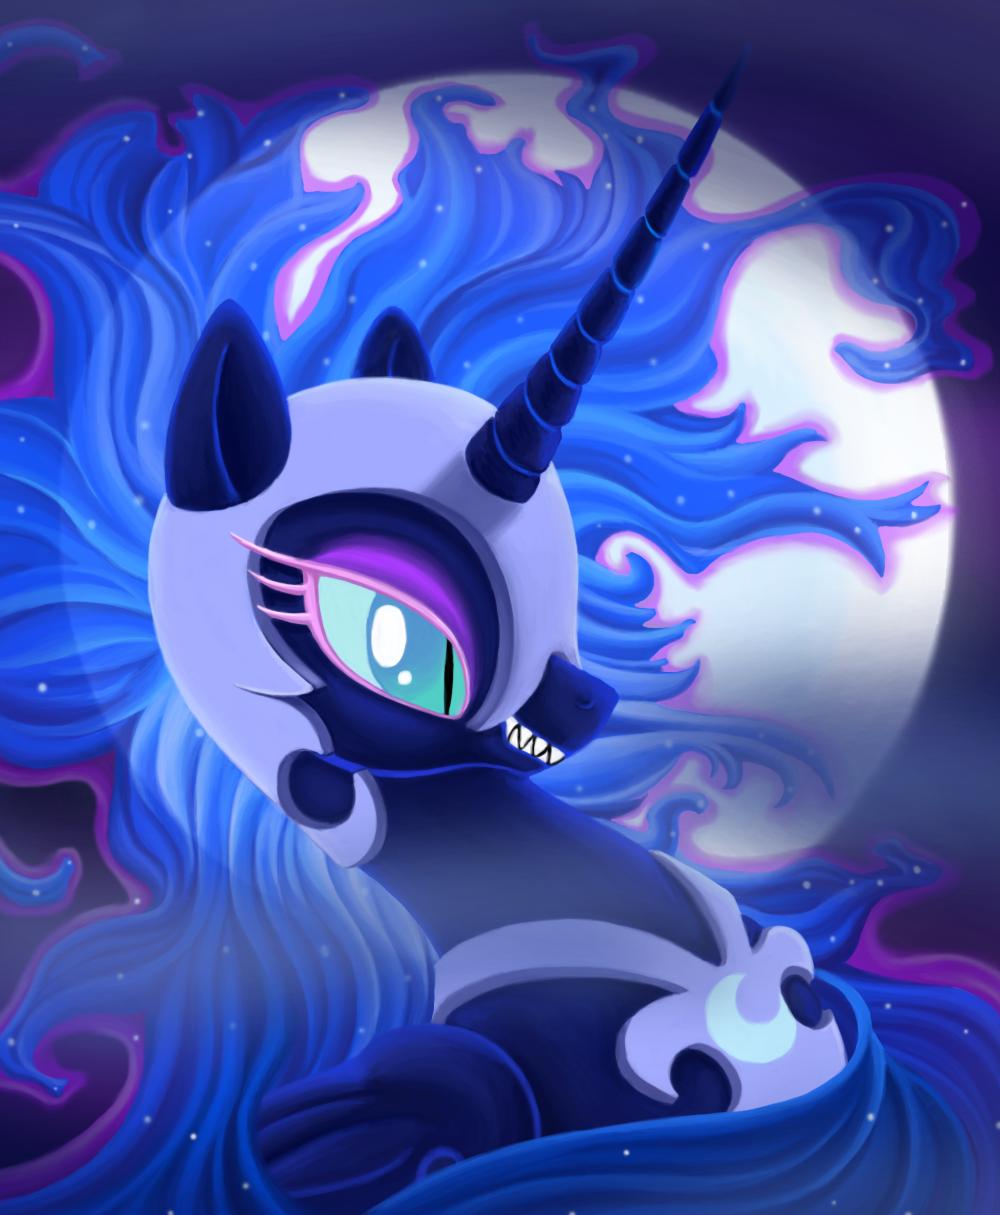 nightmare_moon_by_themovedragenda-d6jttc